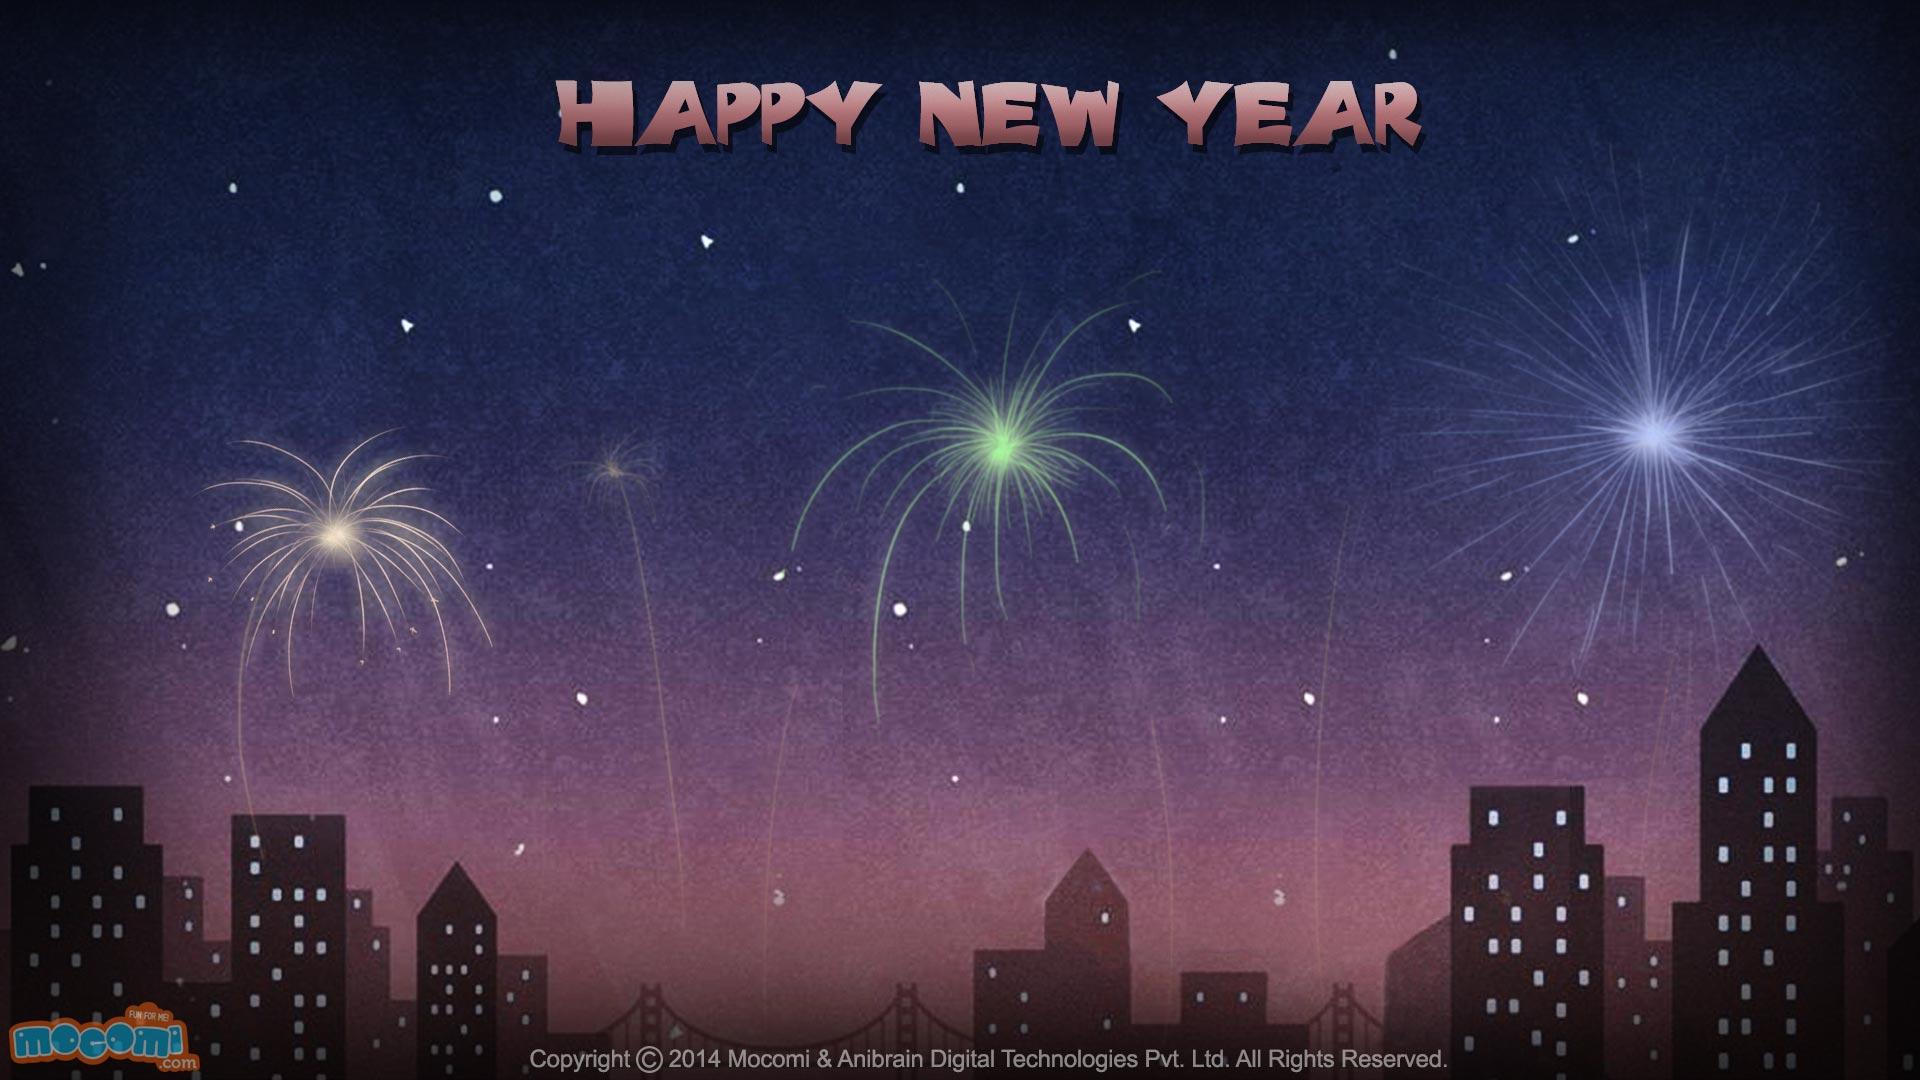 Happy New Year Wallpaper- 12